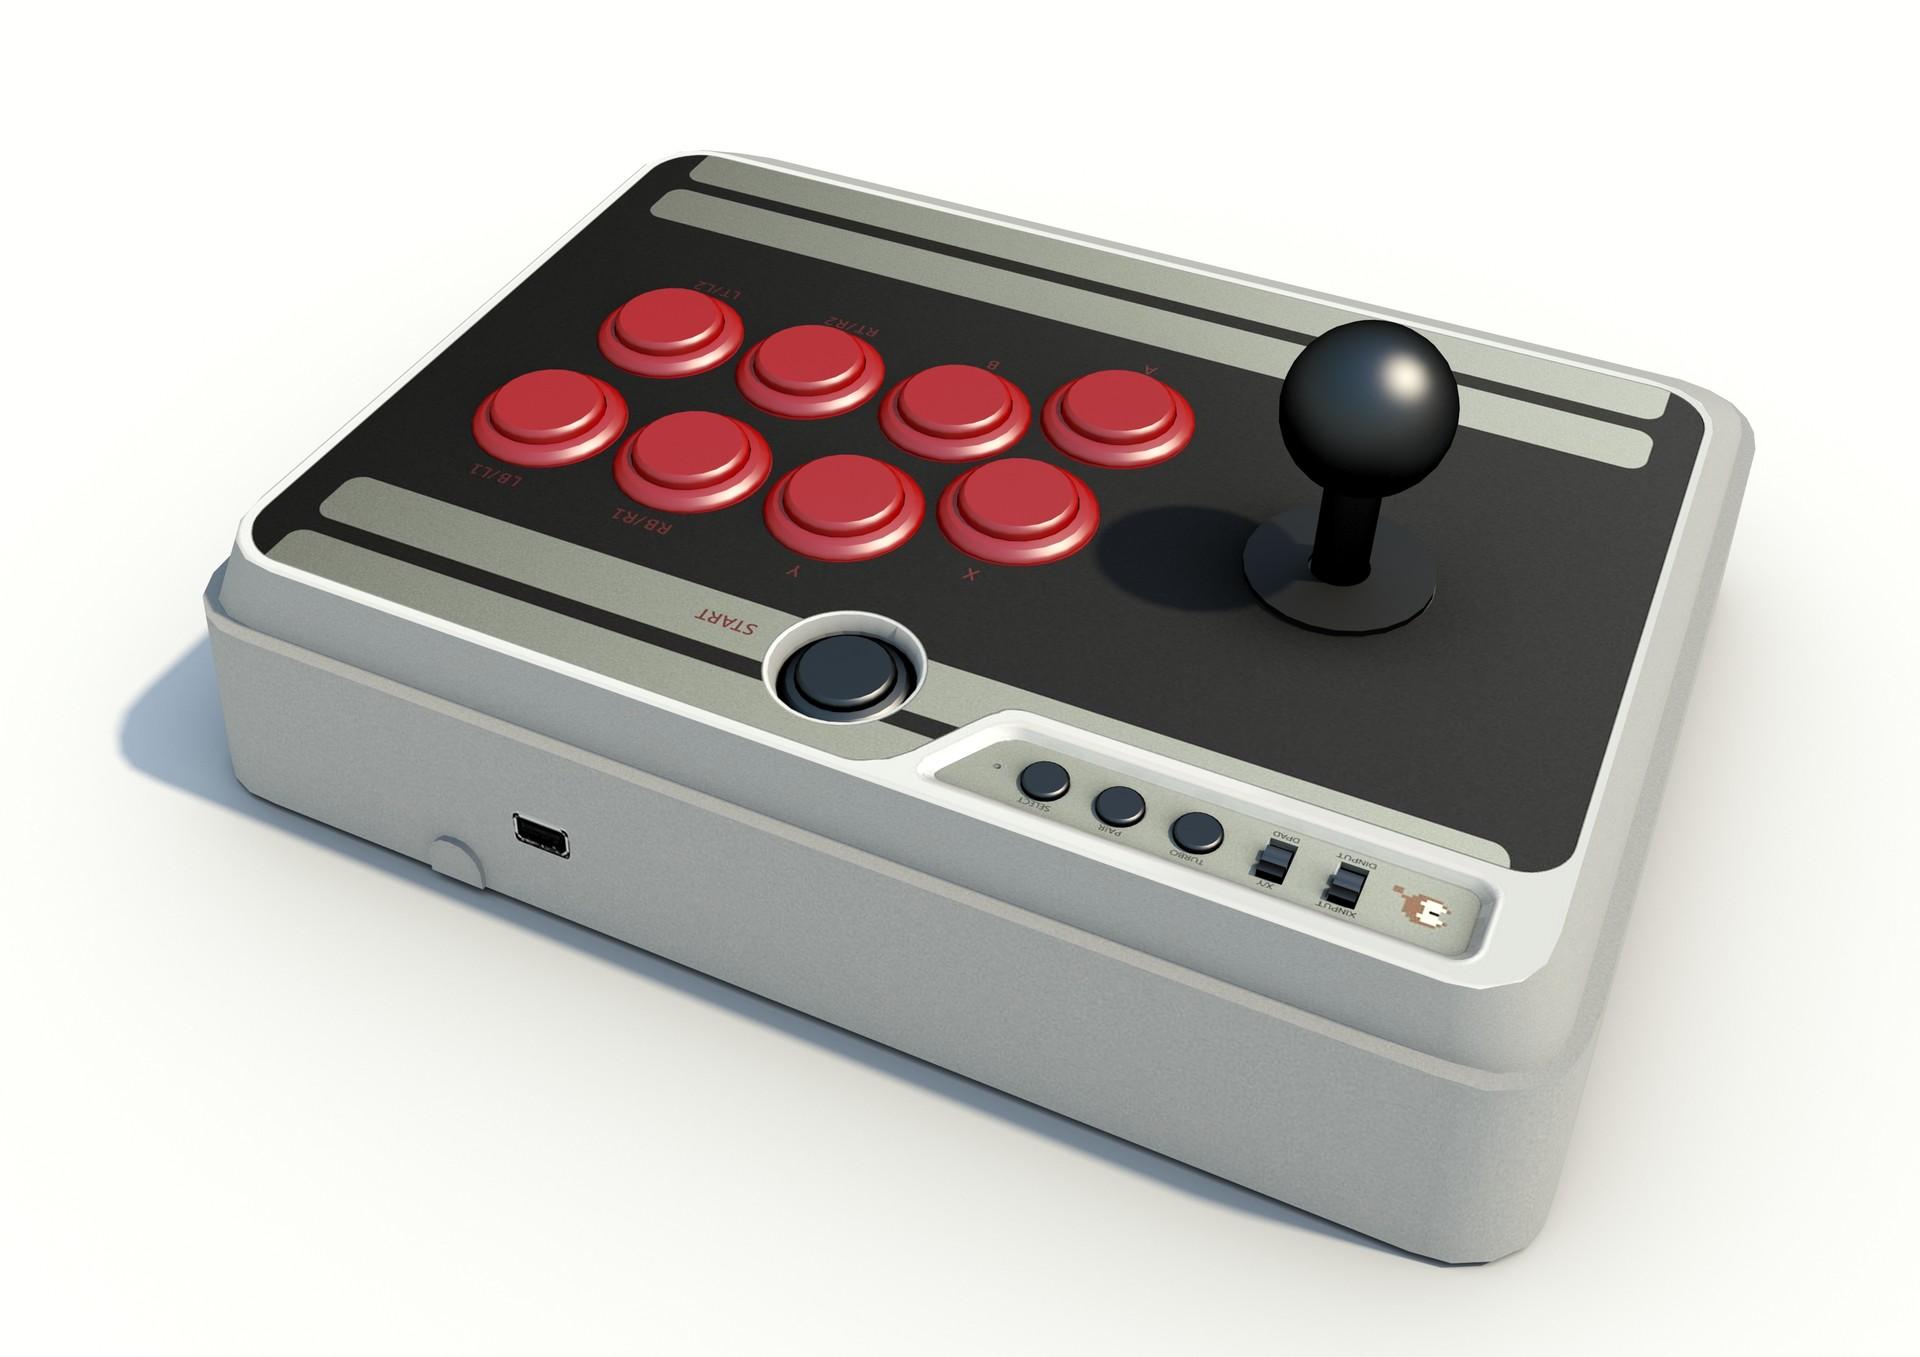 Bryan Ho - 8Bitdo N30 Arcade Stick